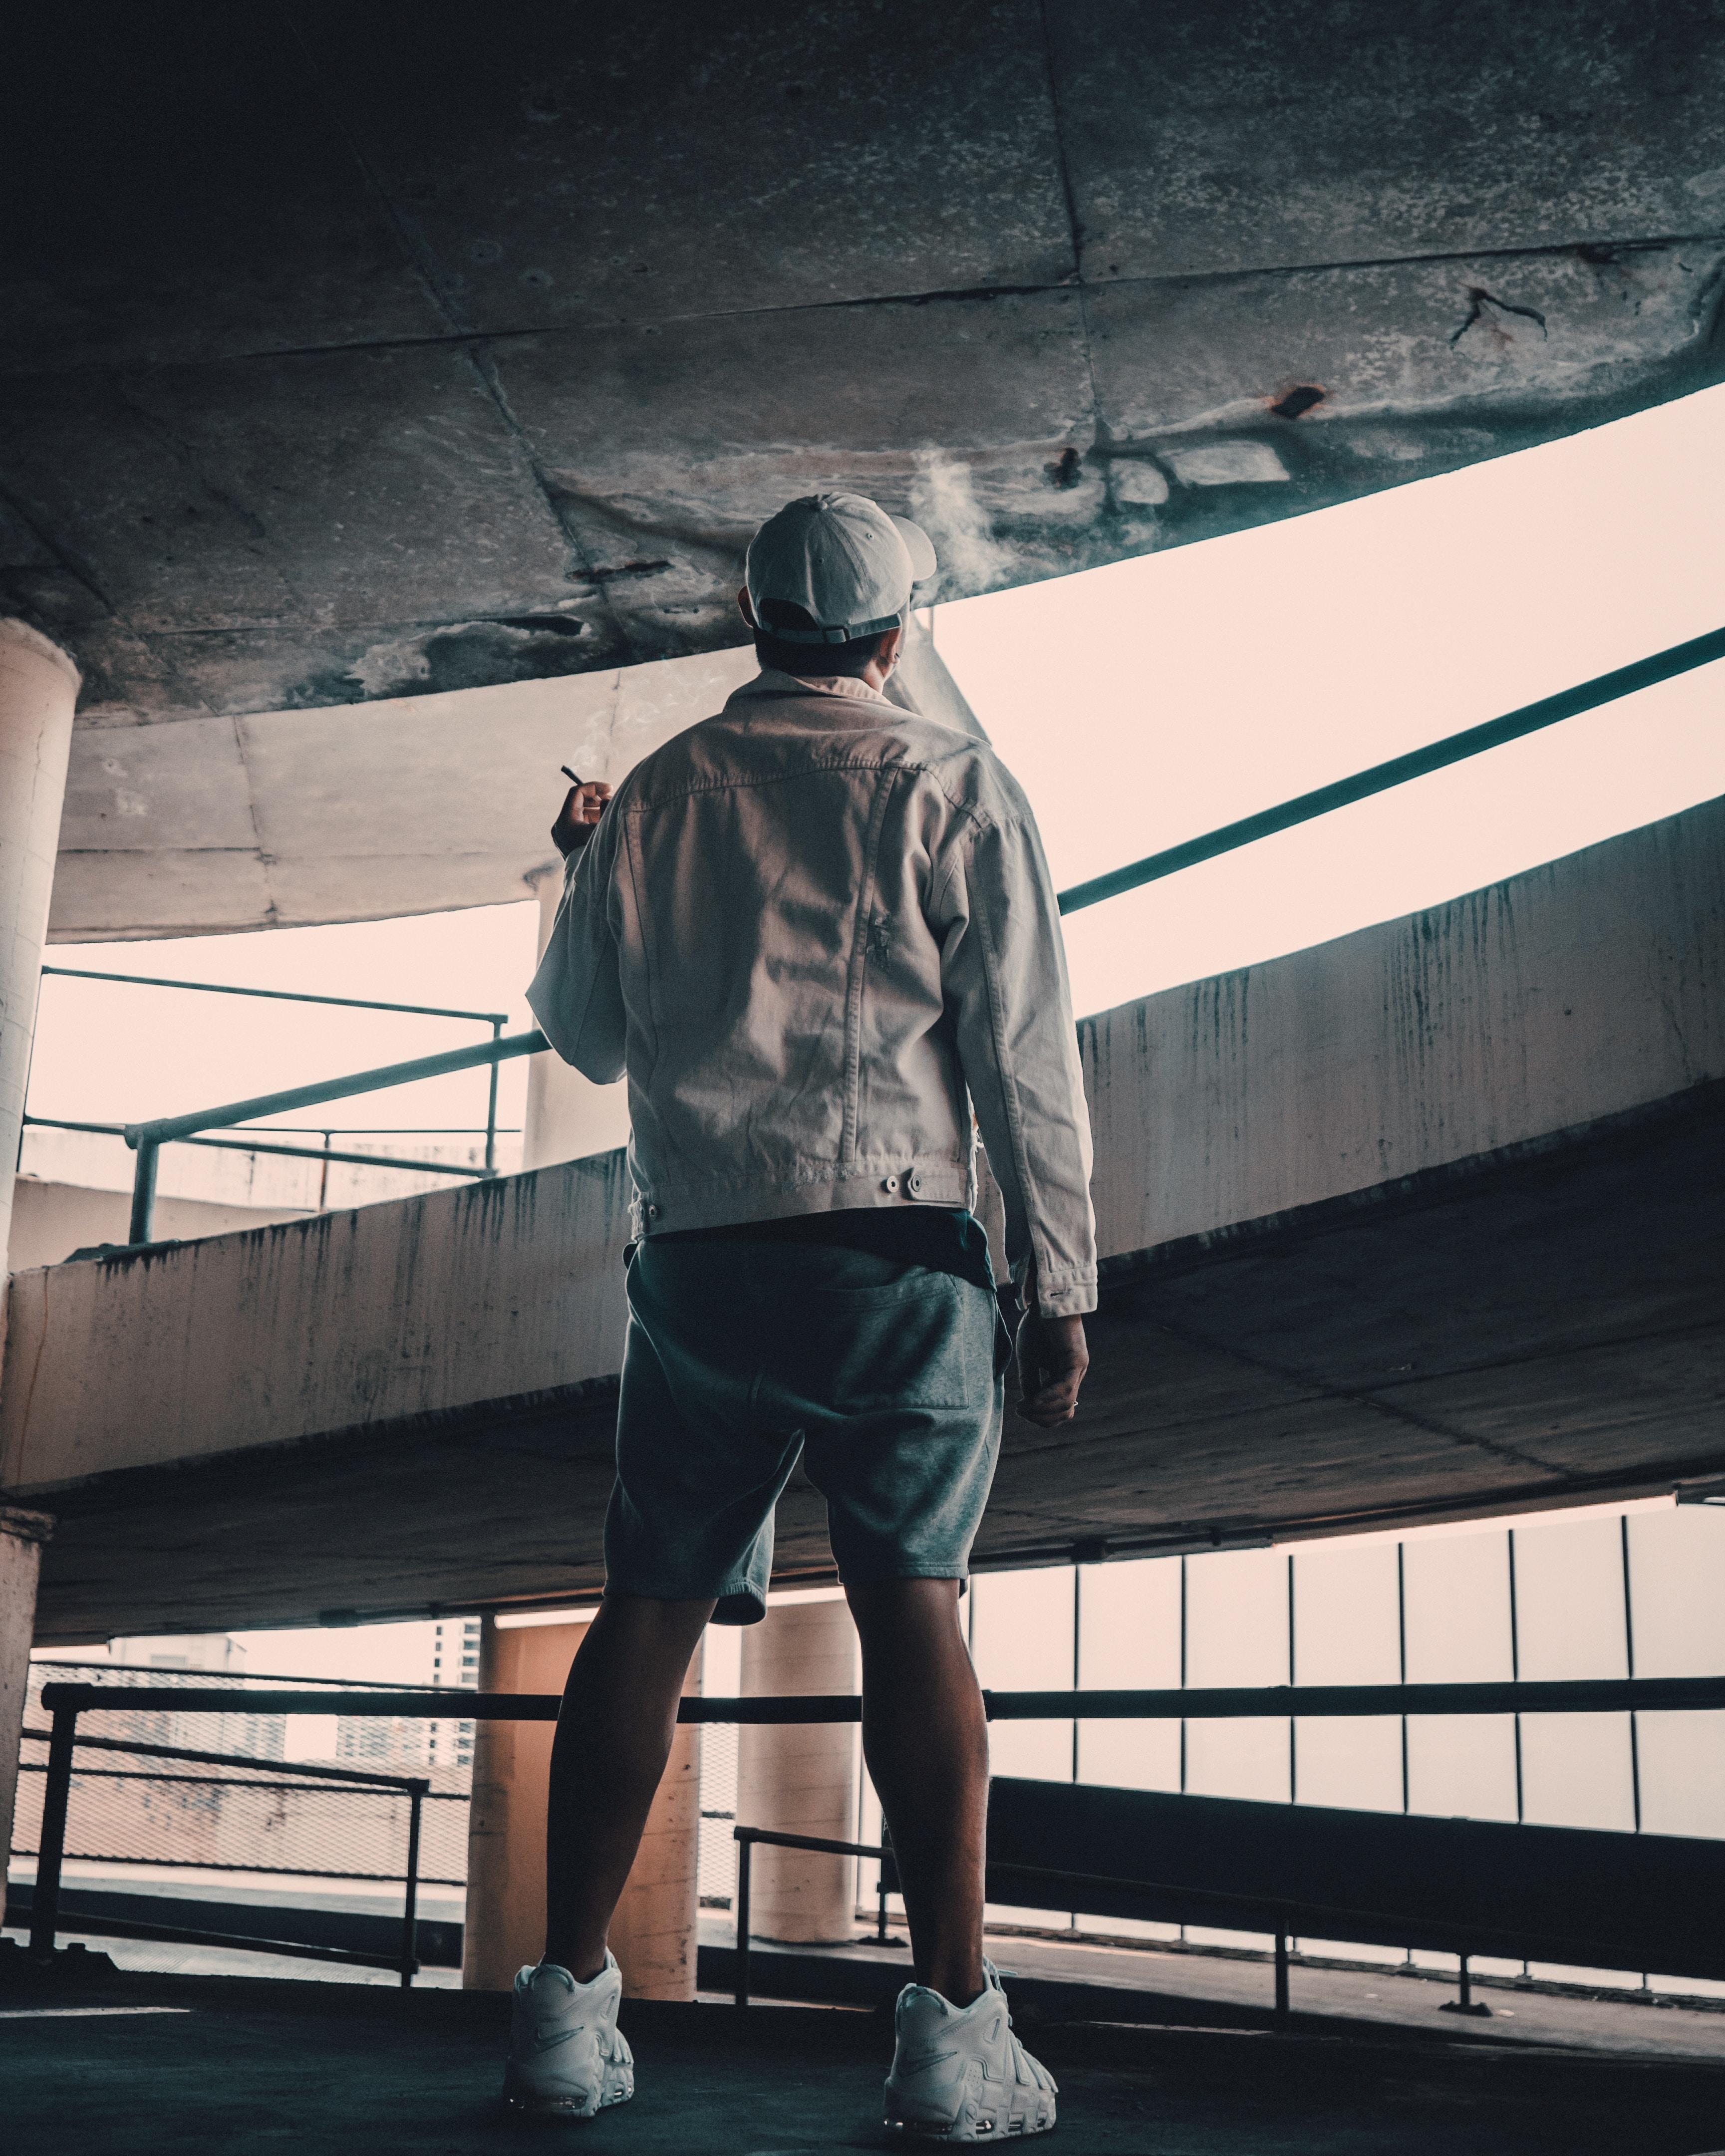 man standing in ramp way